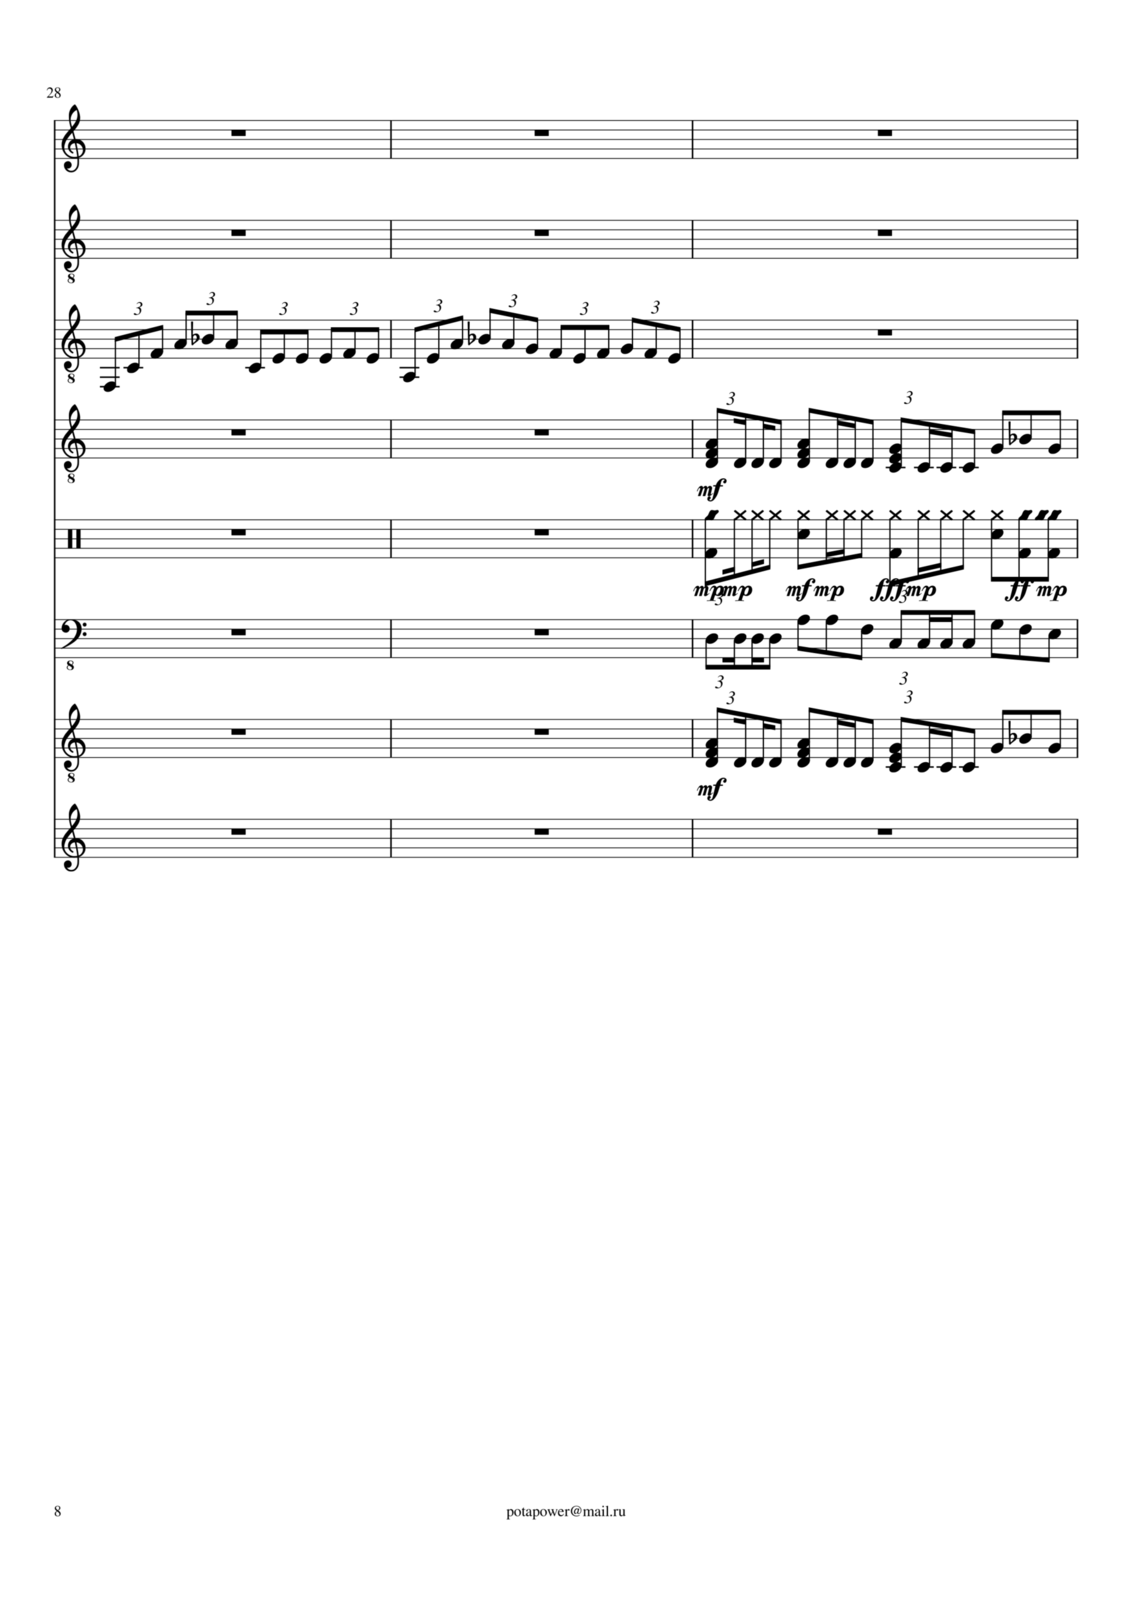 Korolevstvo slez slide, Image 8